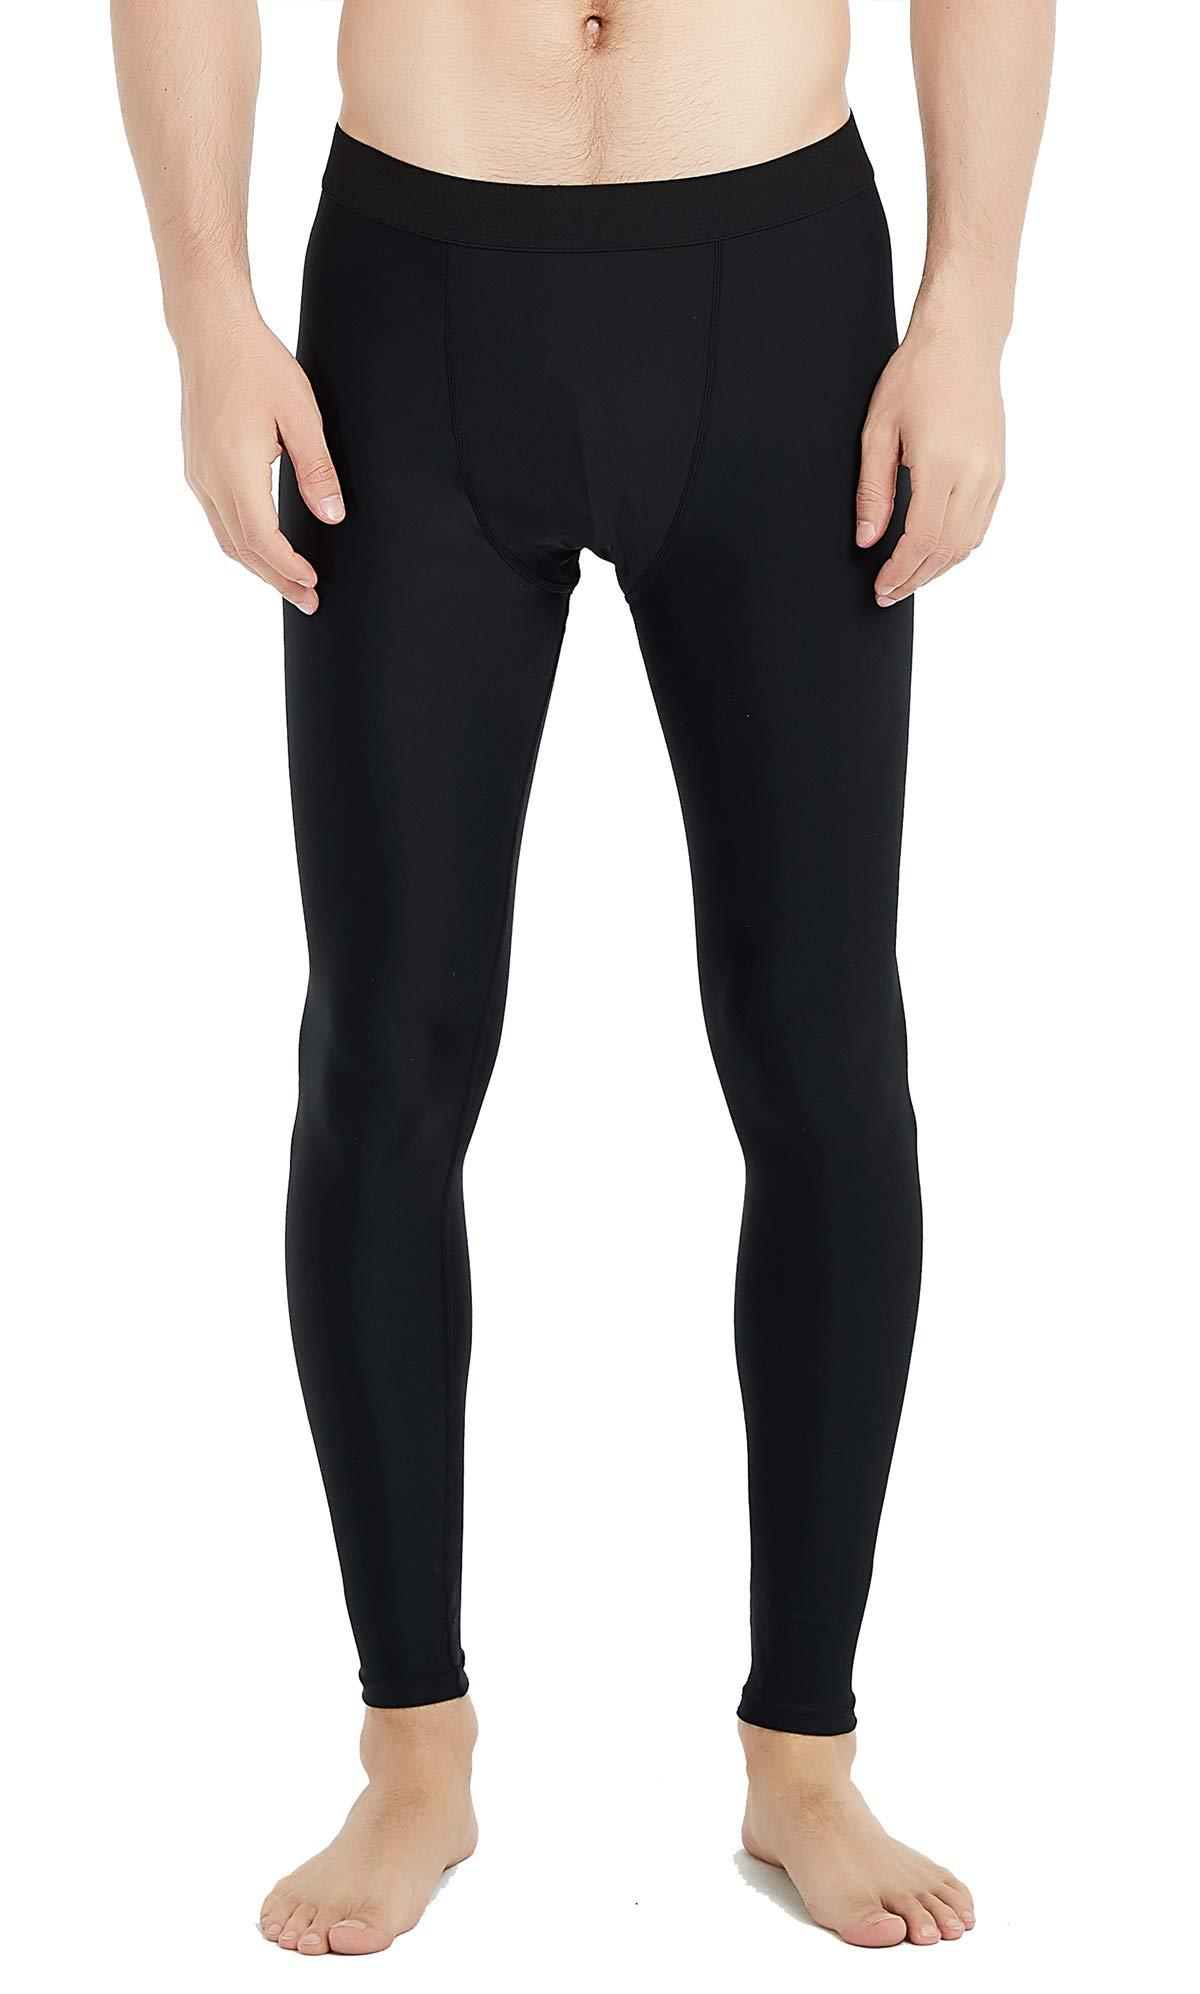 UPF 50+Men's Surfing Leggings Sun Protection High-Waist Tummy Control Swimming Pants(6006black-L) by Lemorecn